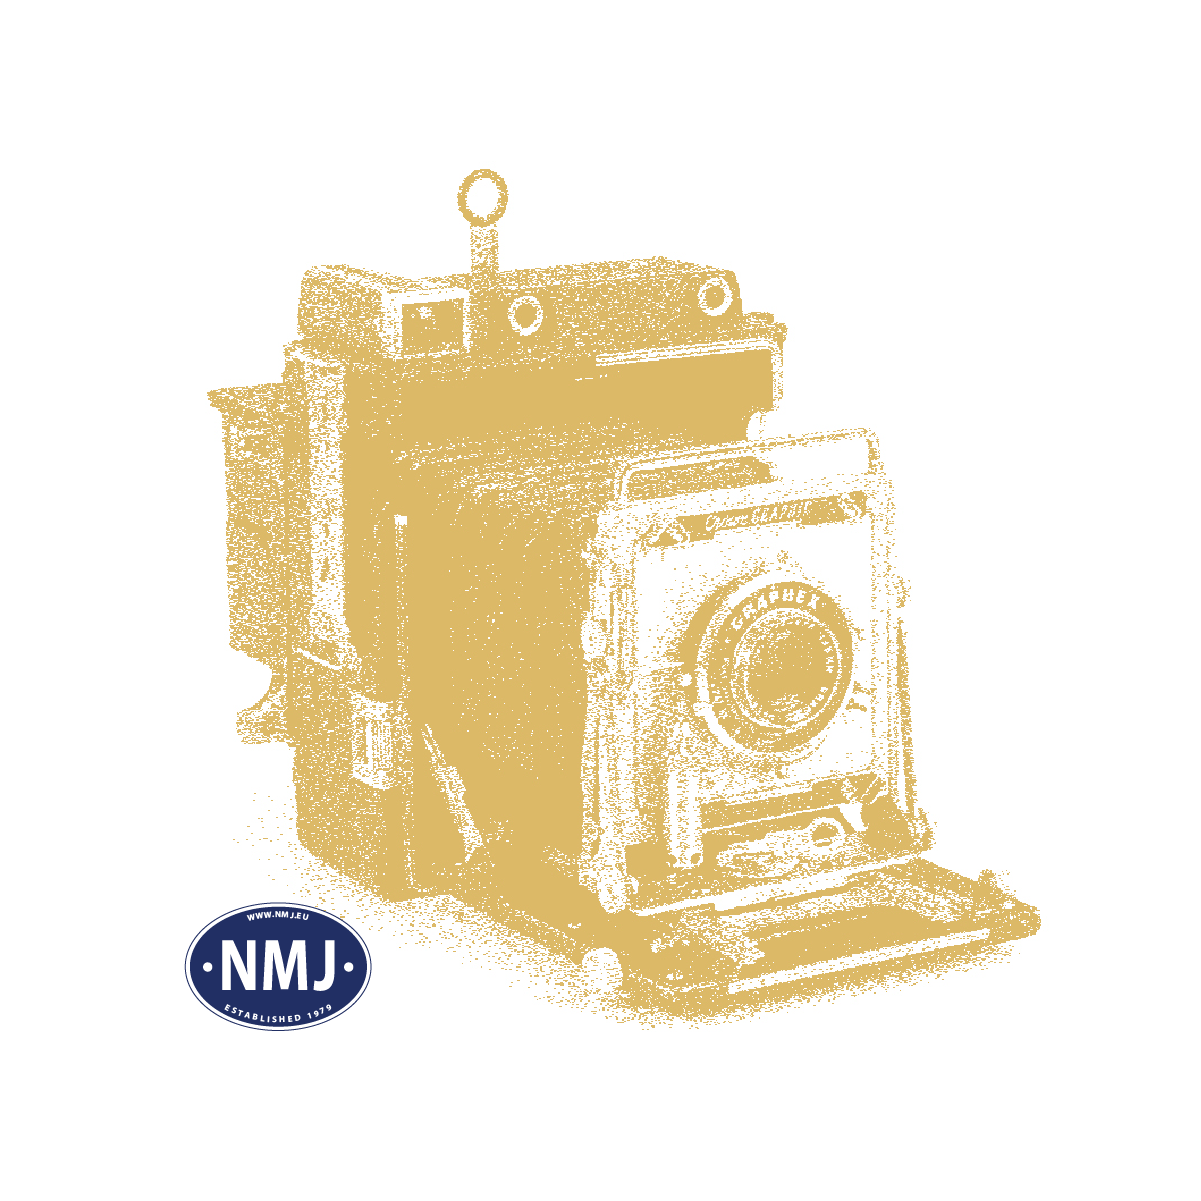 MBR51-2106 - Kanadische Pappel Sommer, 6-10cm, N